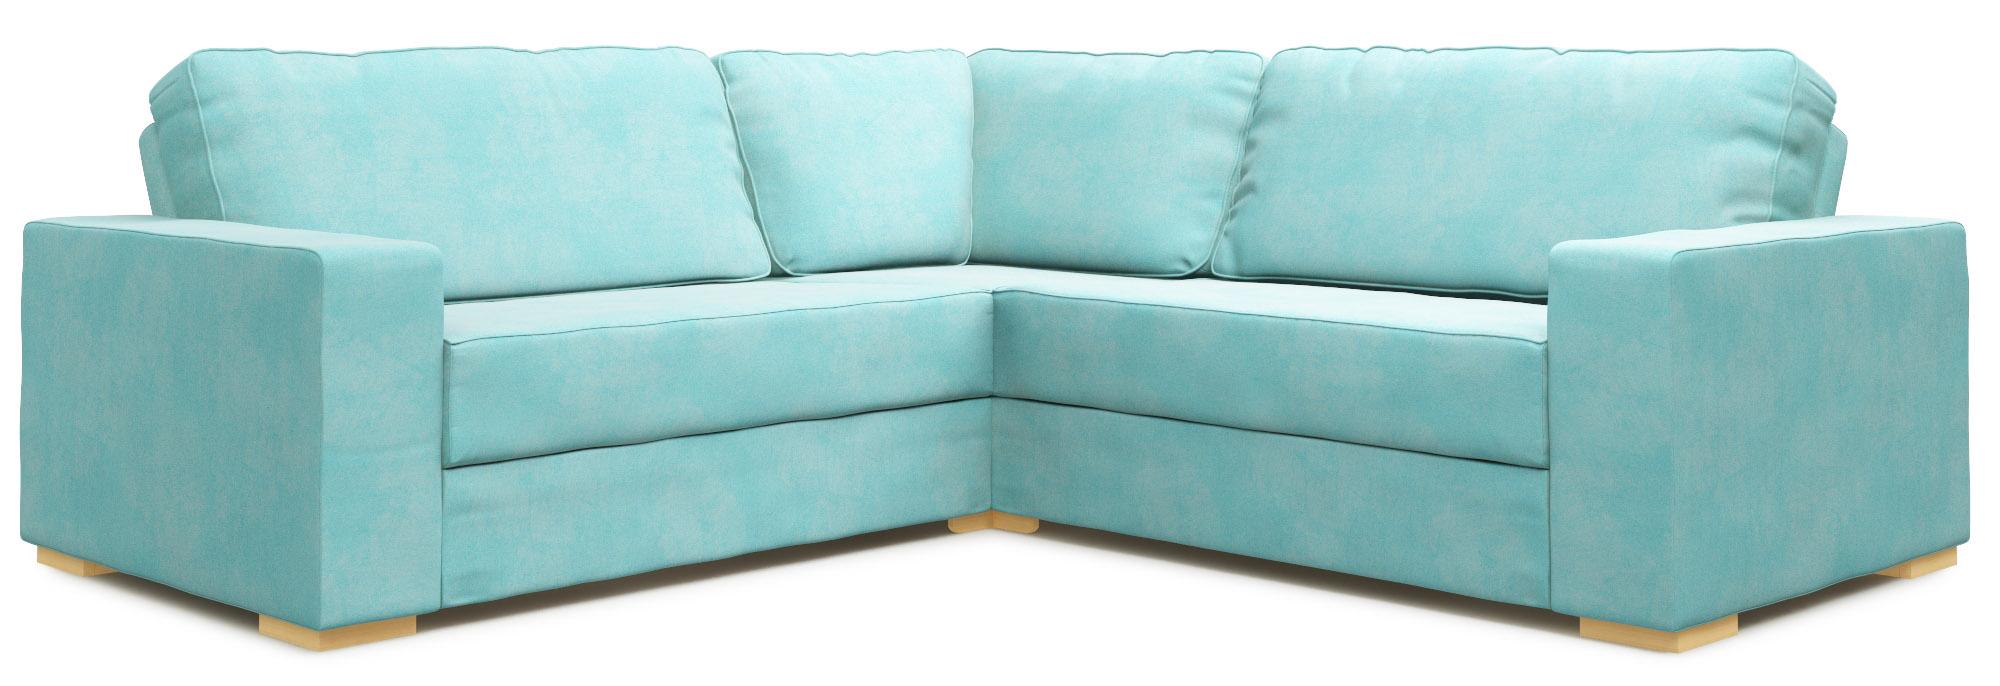 Xia 2x2 Armless Single Modular Sofa Bed Nabru